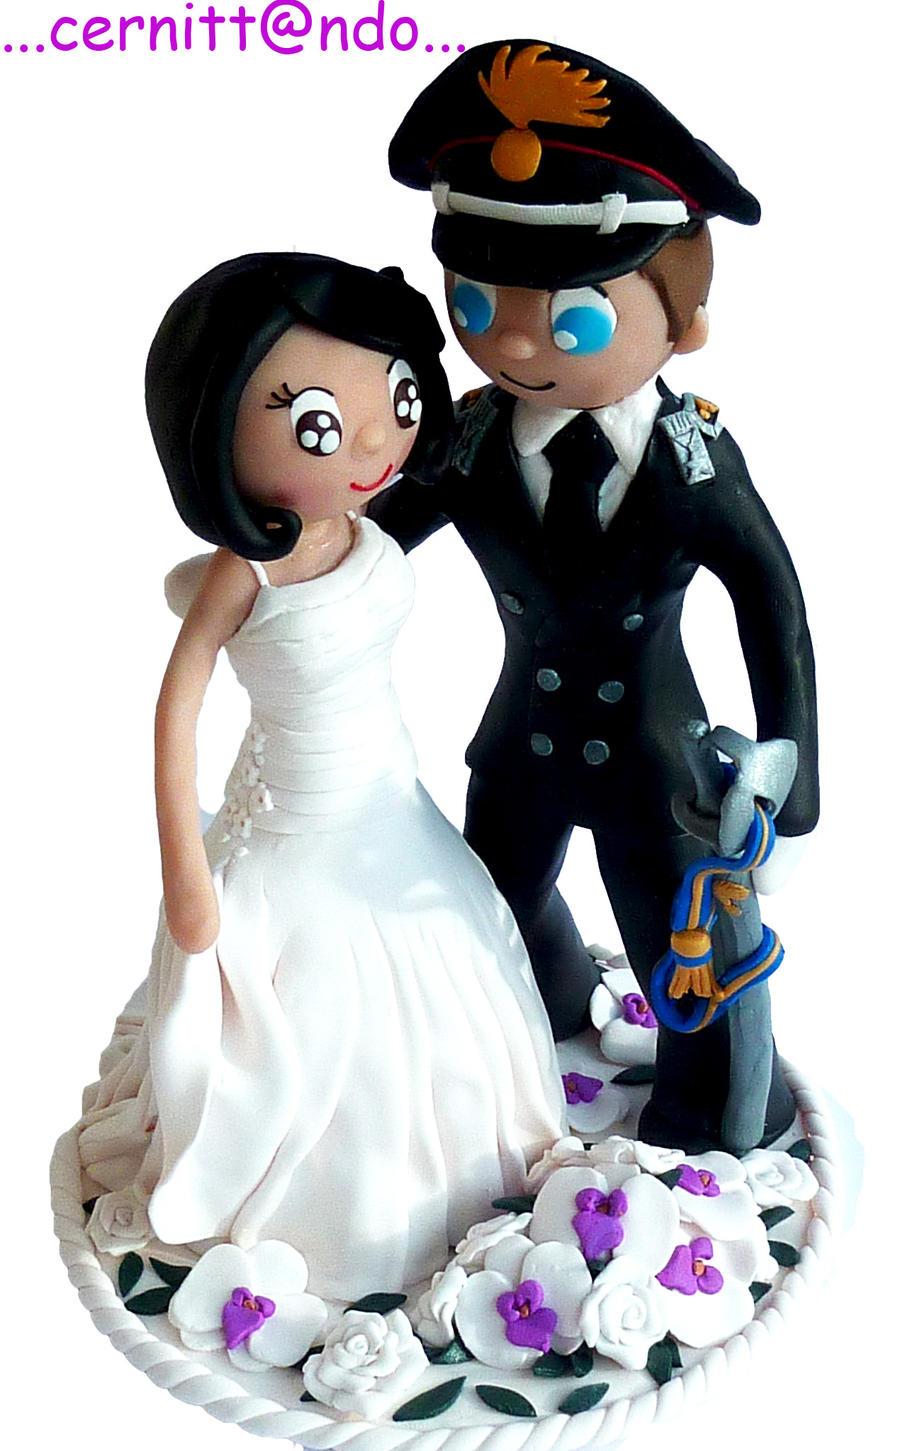 Fimo Wedding Cake Topper by cernittando on DeviantArt